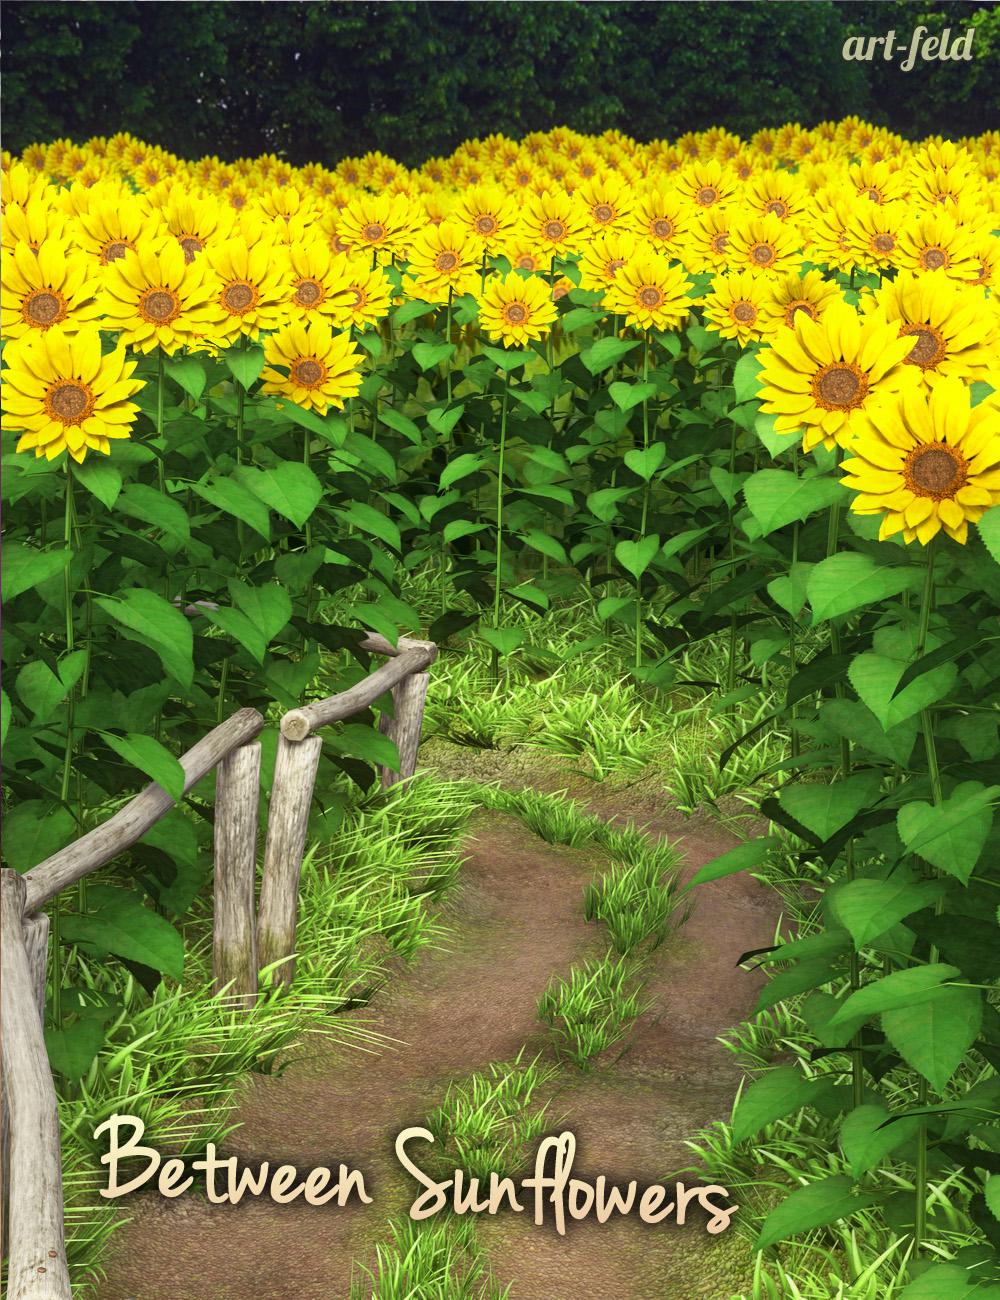 Between Sunflowers by: art-feld, 3D Models by Daz 3D